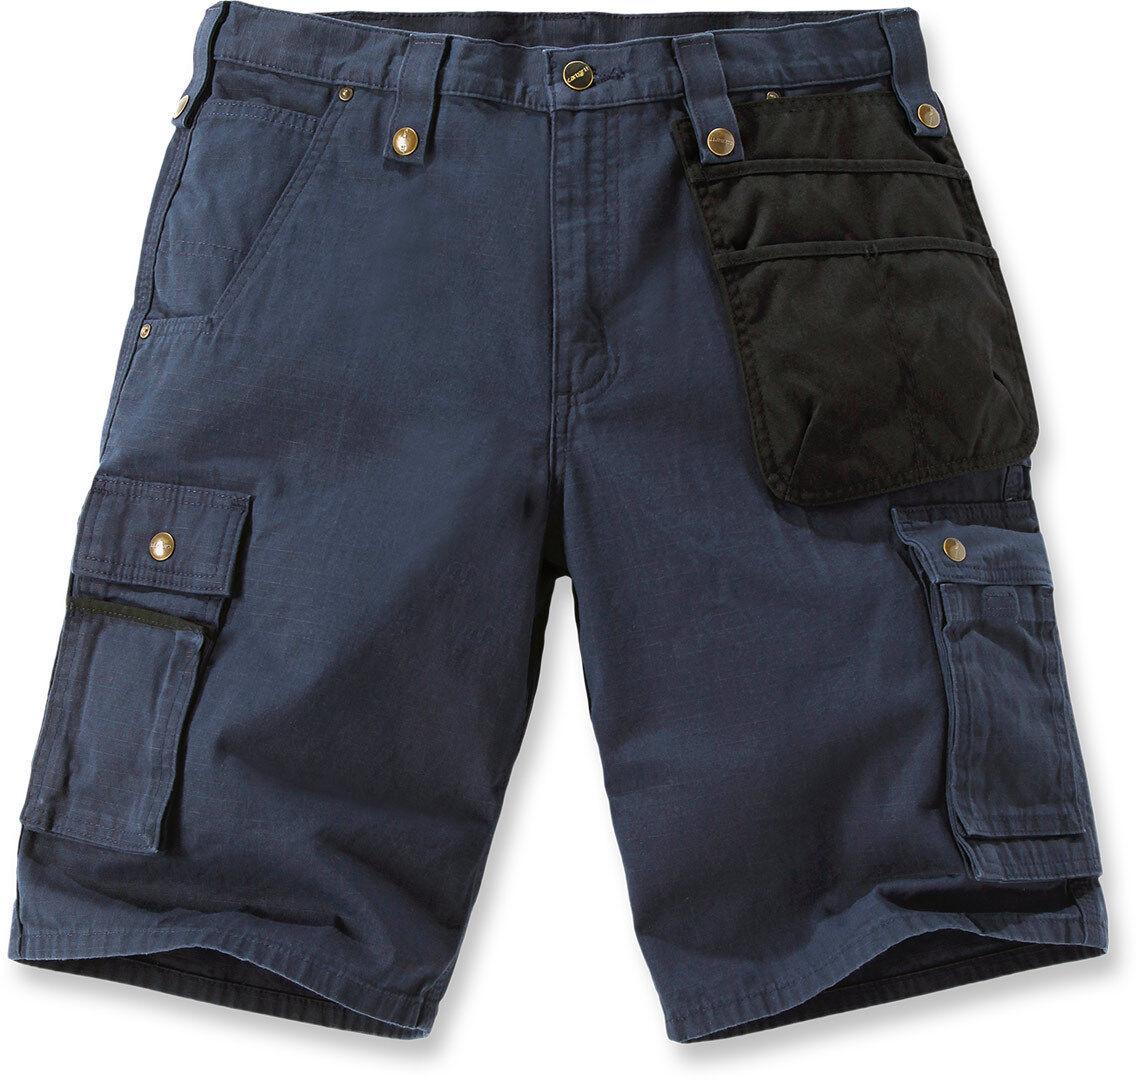 Carhartt Multi Pocket Ripstop Pantalones cortos Azul 36